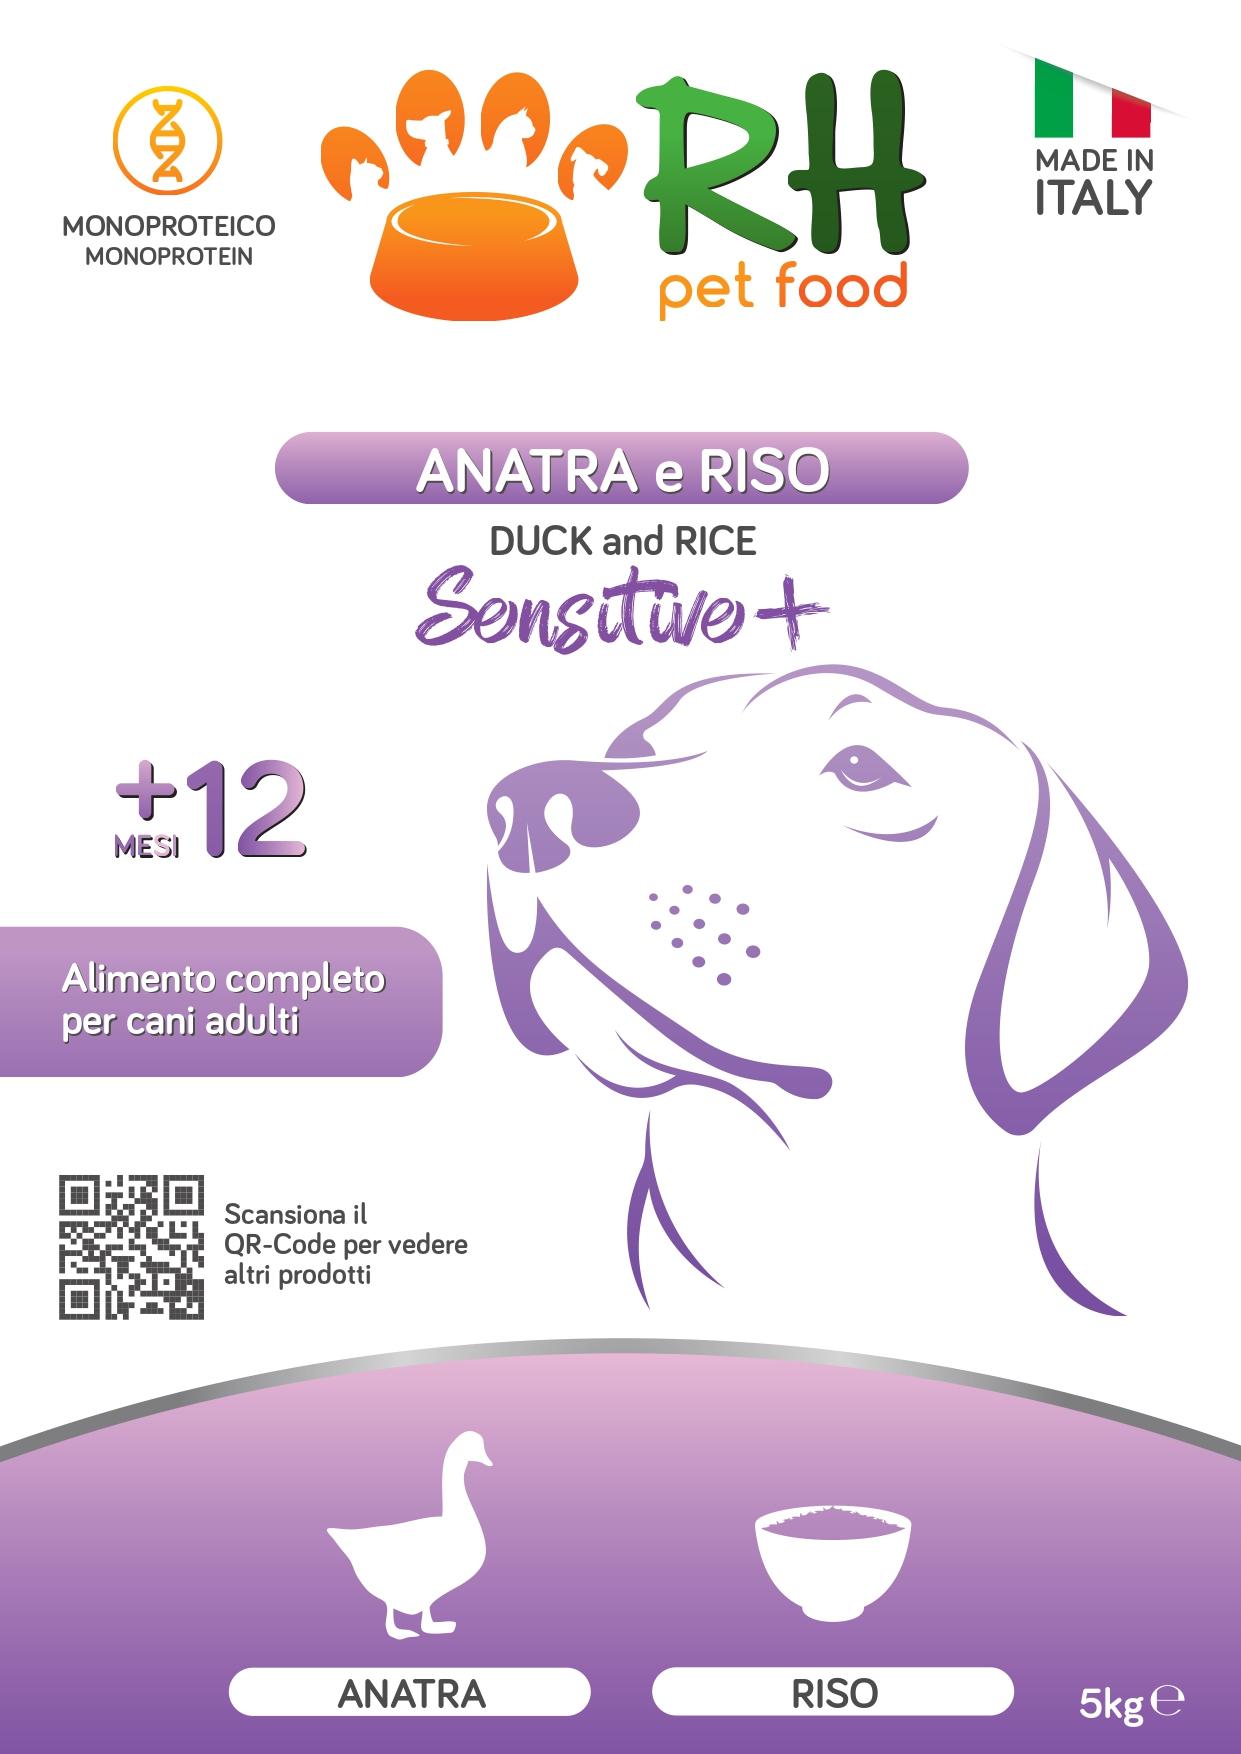 Anatra e Riso monoproteico